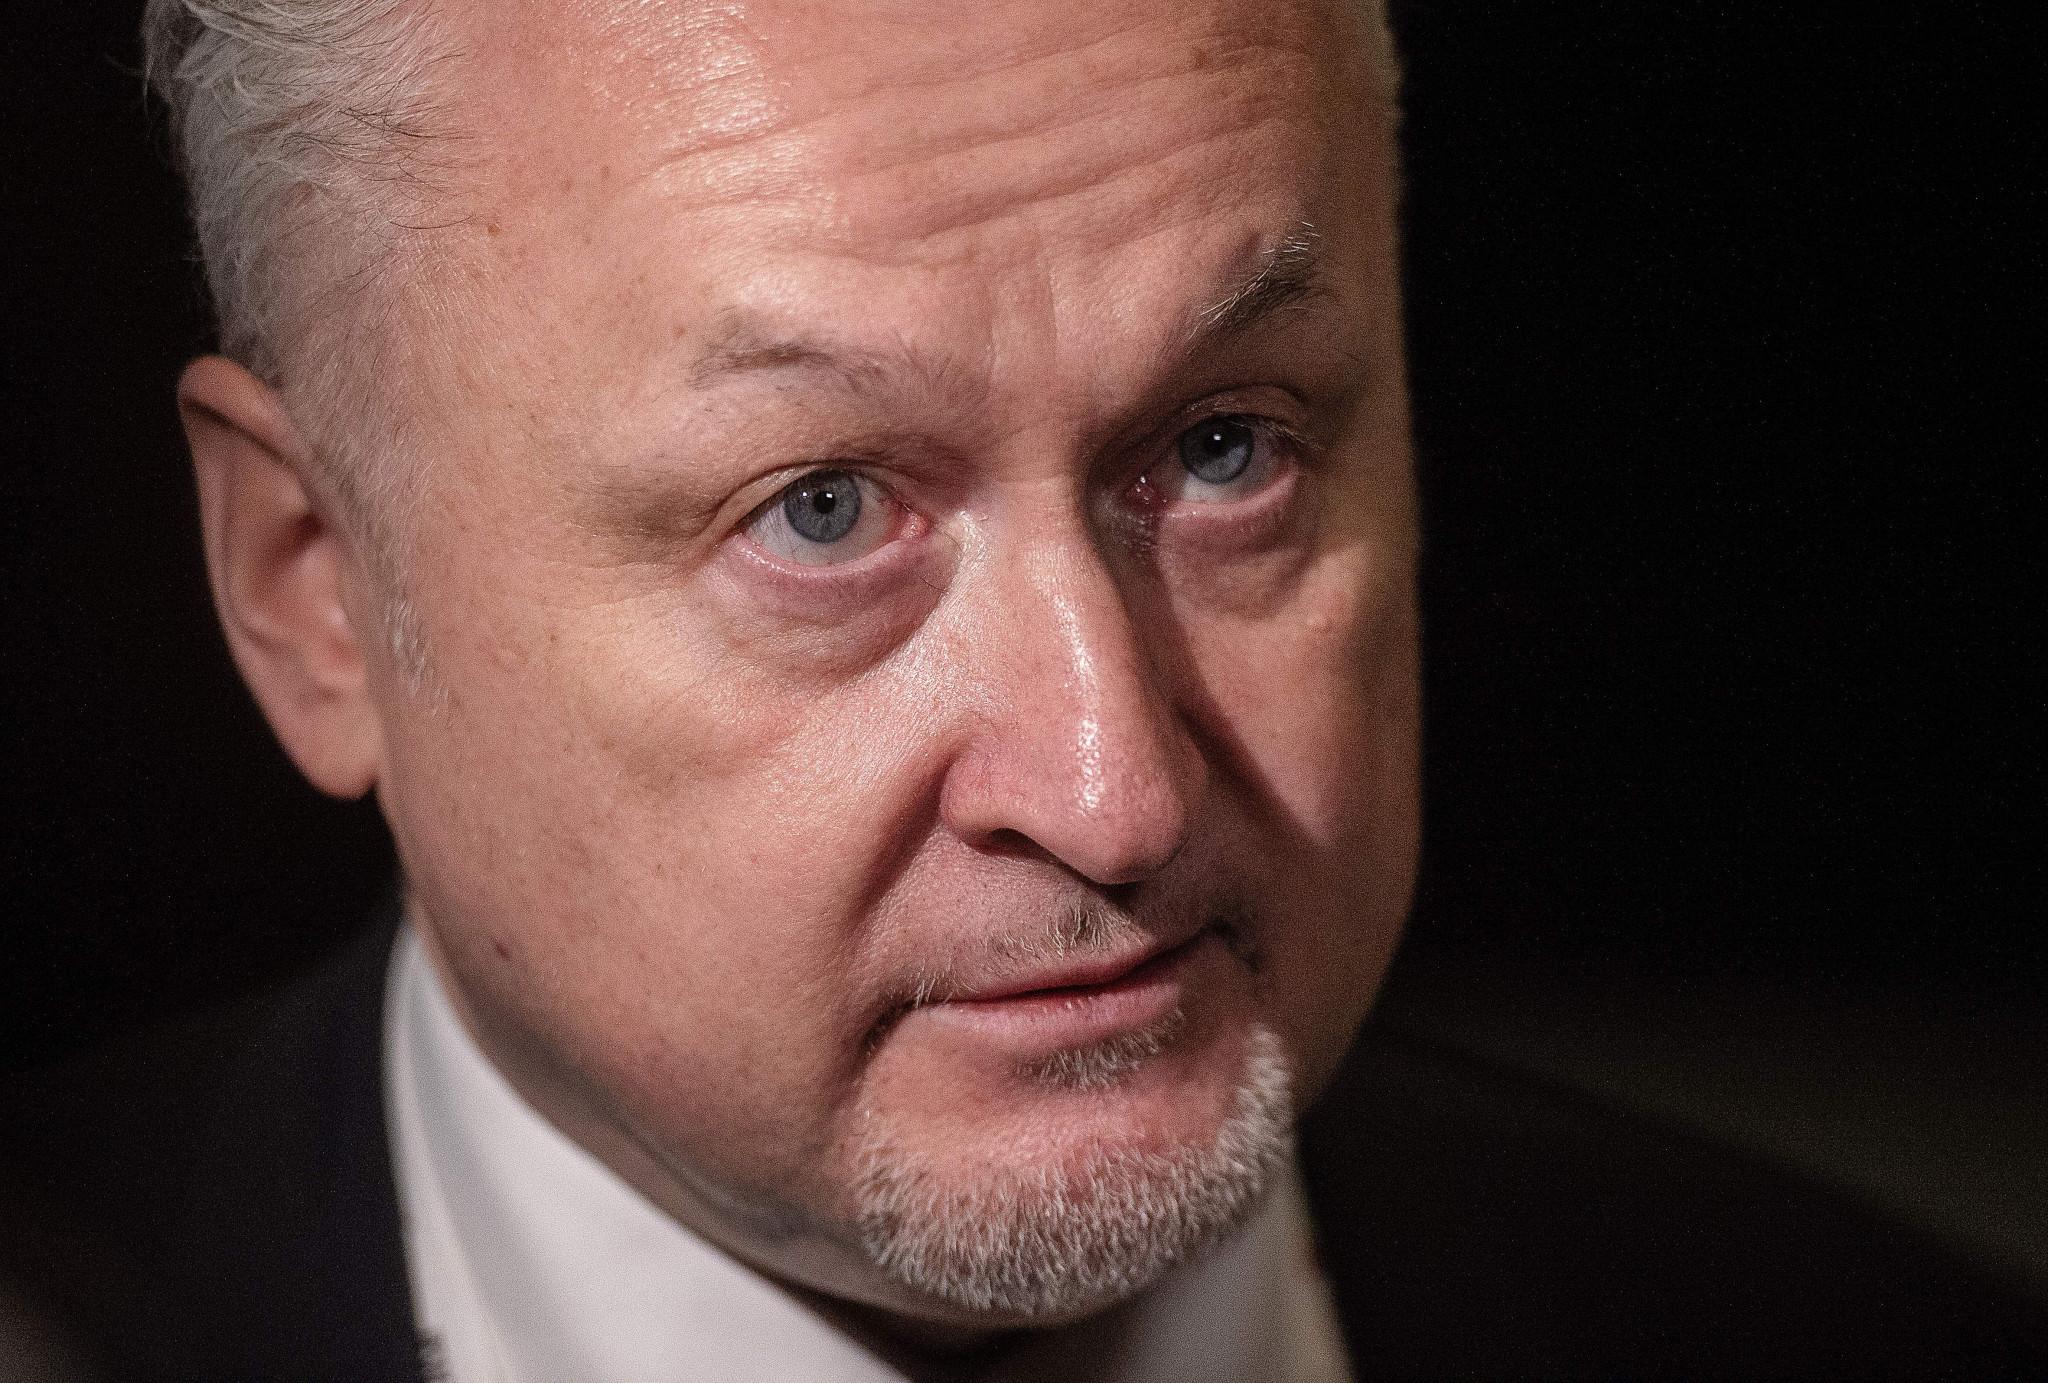 Yuri Ganus has denied allegations of wrongdoing at RUSADA ©Getty Images